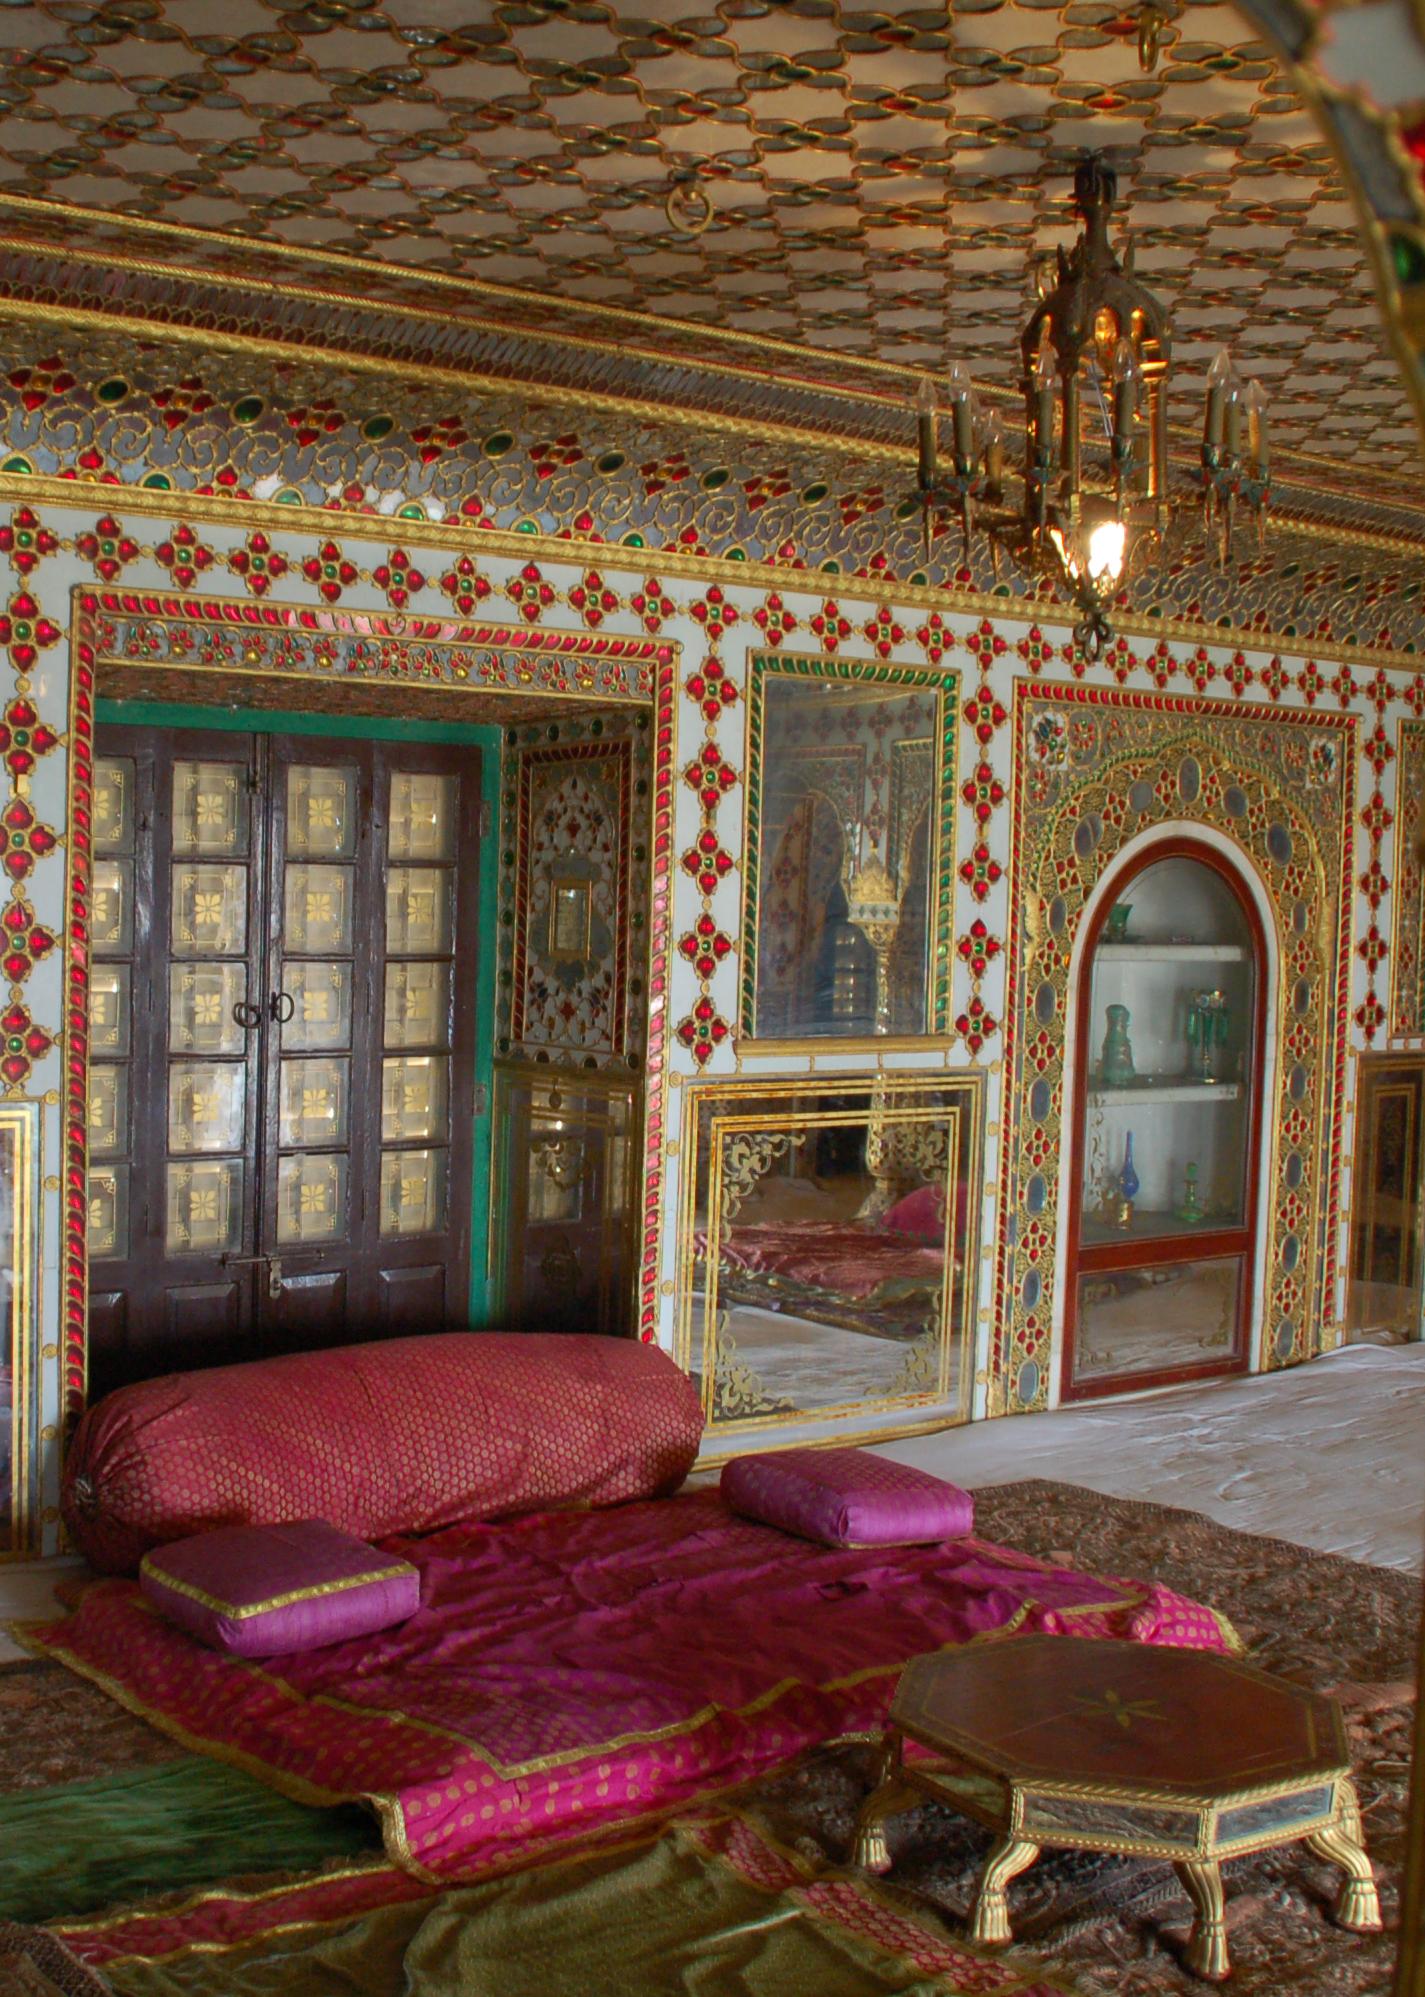 File:Jaipur city palace interior, Rajasthan.jpg - Wikipedia, the free ...